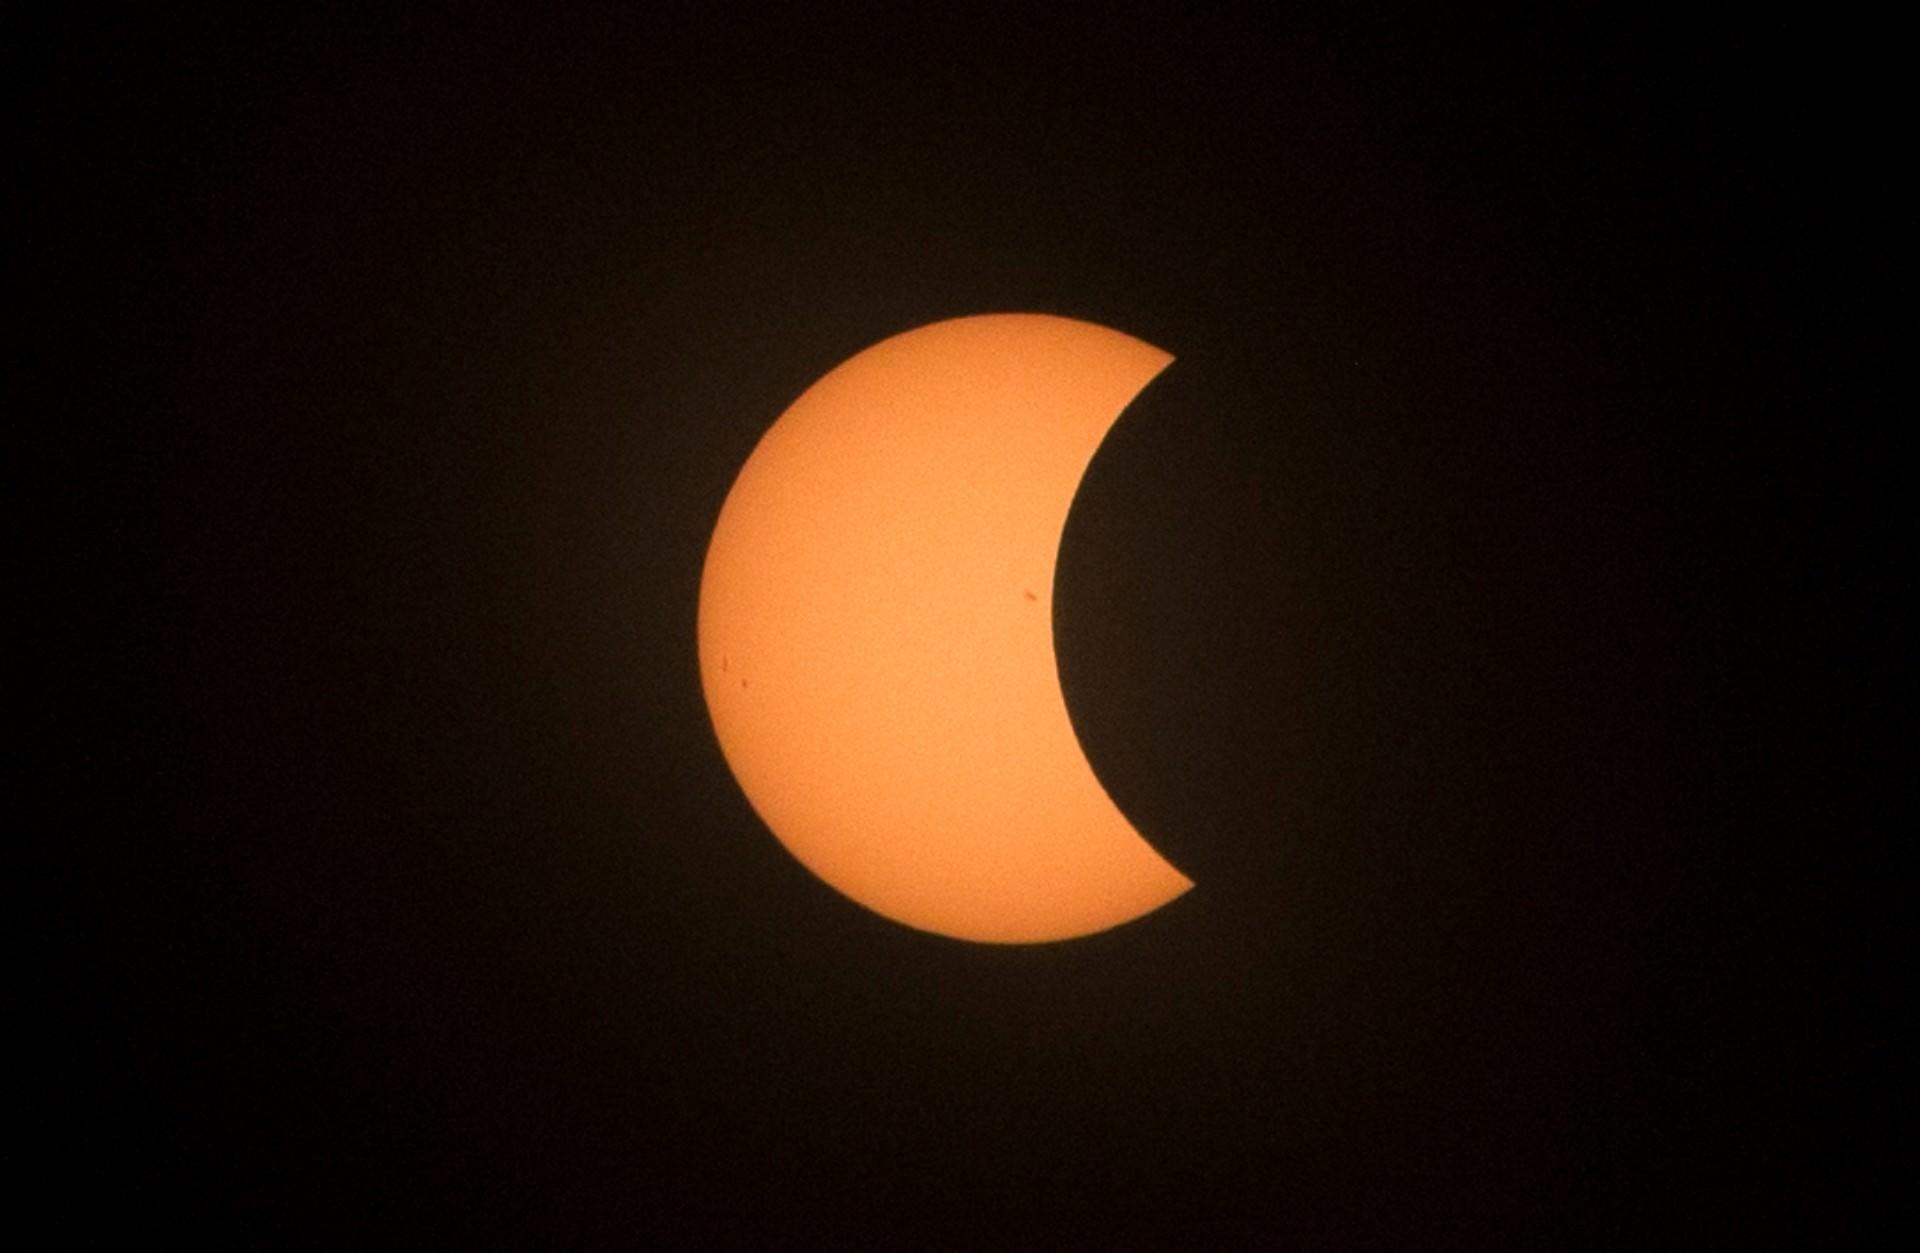 solar eclipse close up